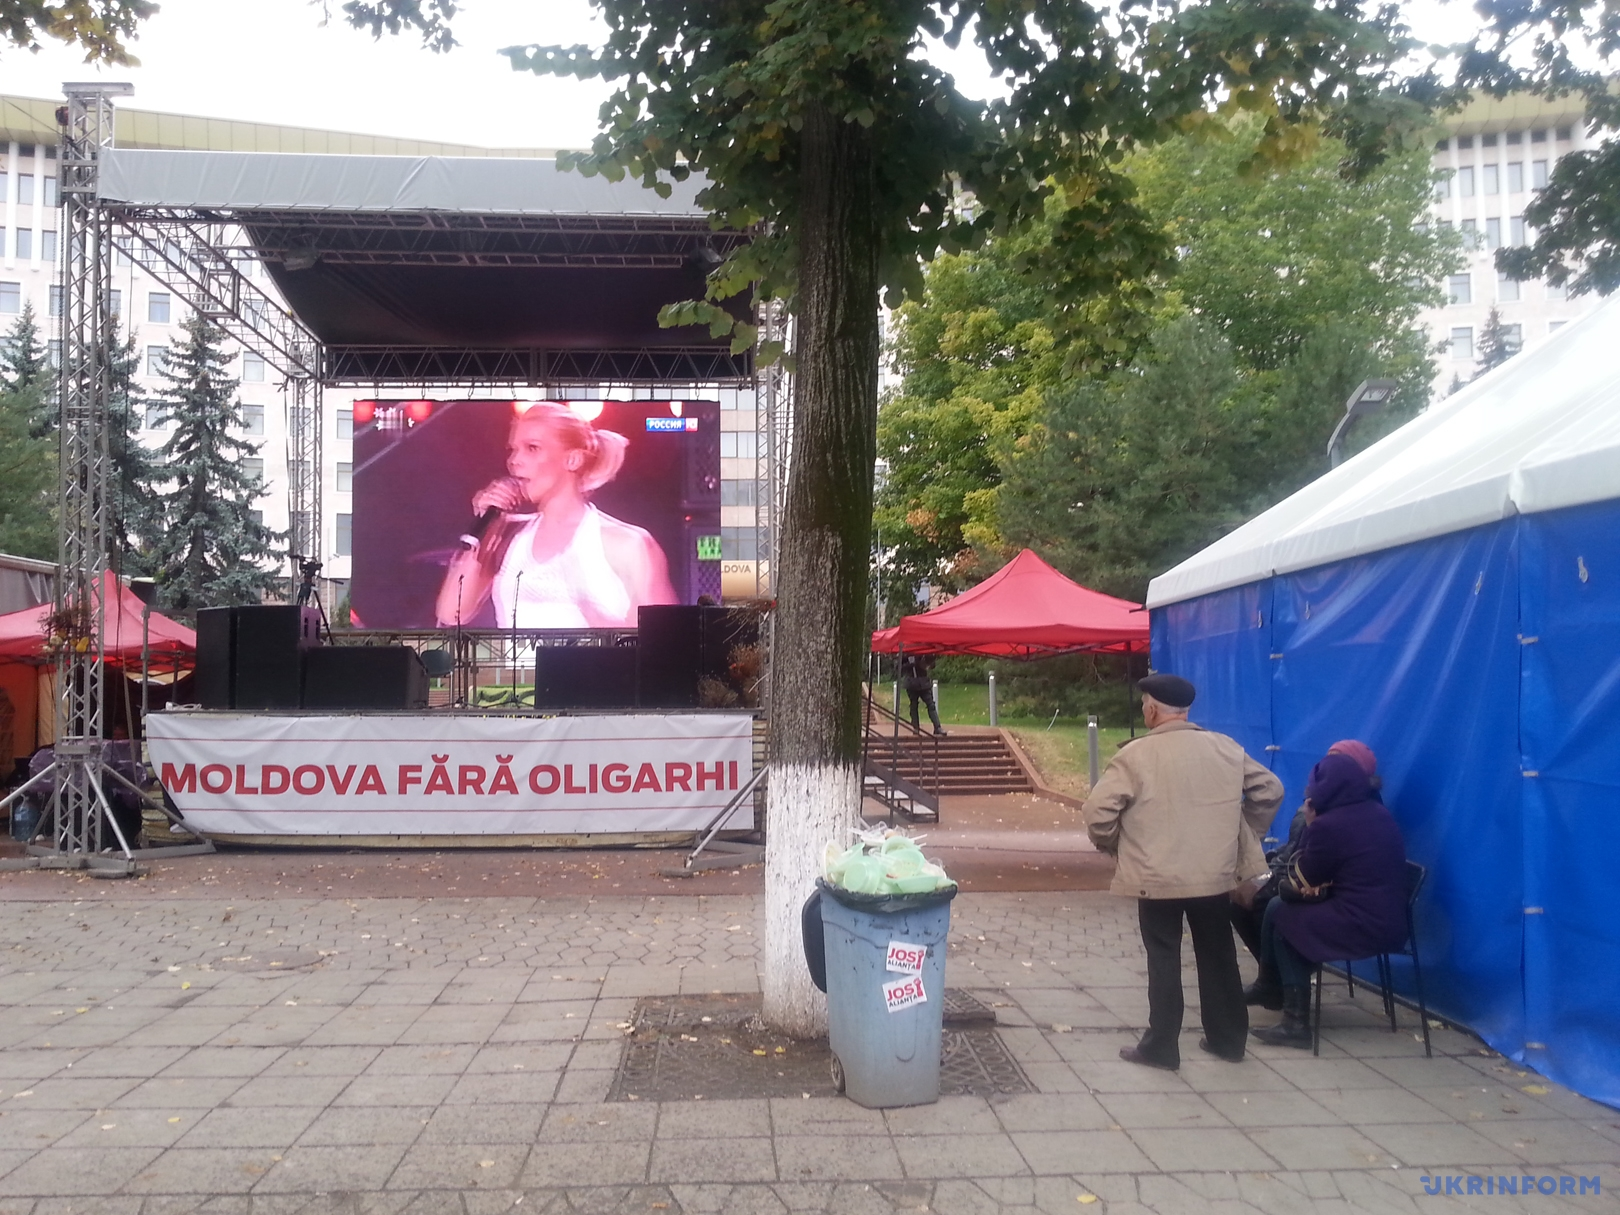 Еще один слоган протестующих - Молдова без олигархов